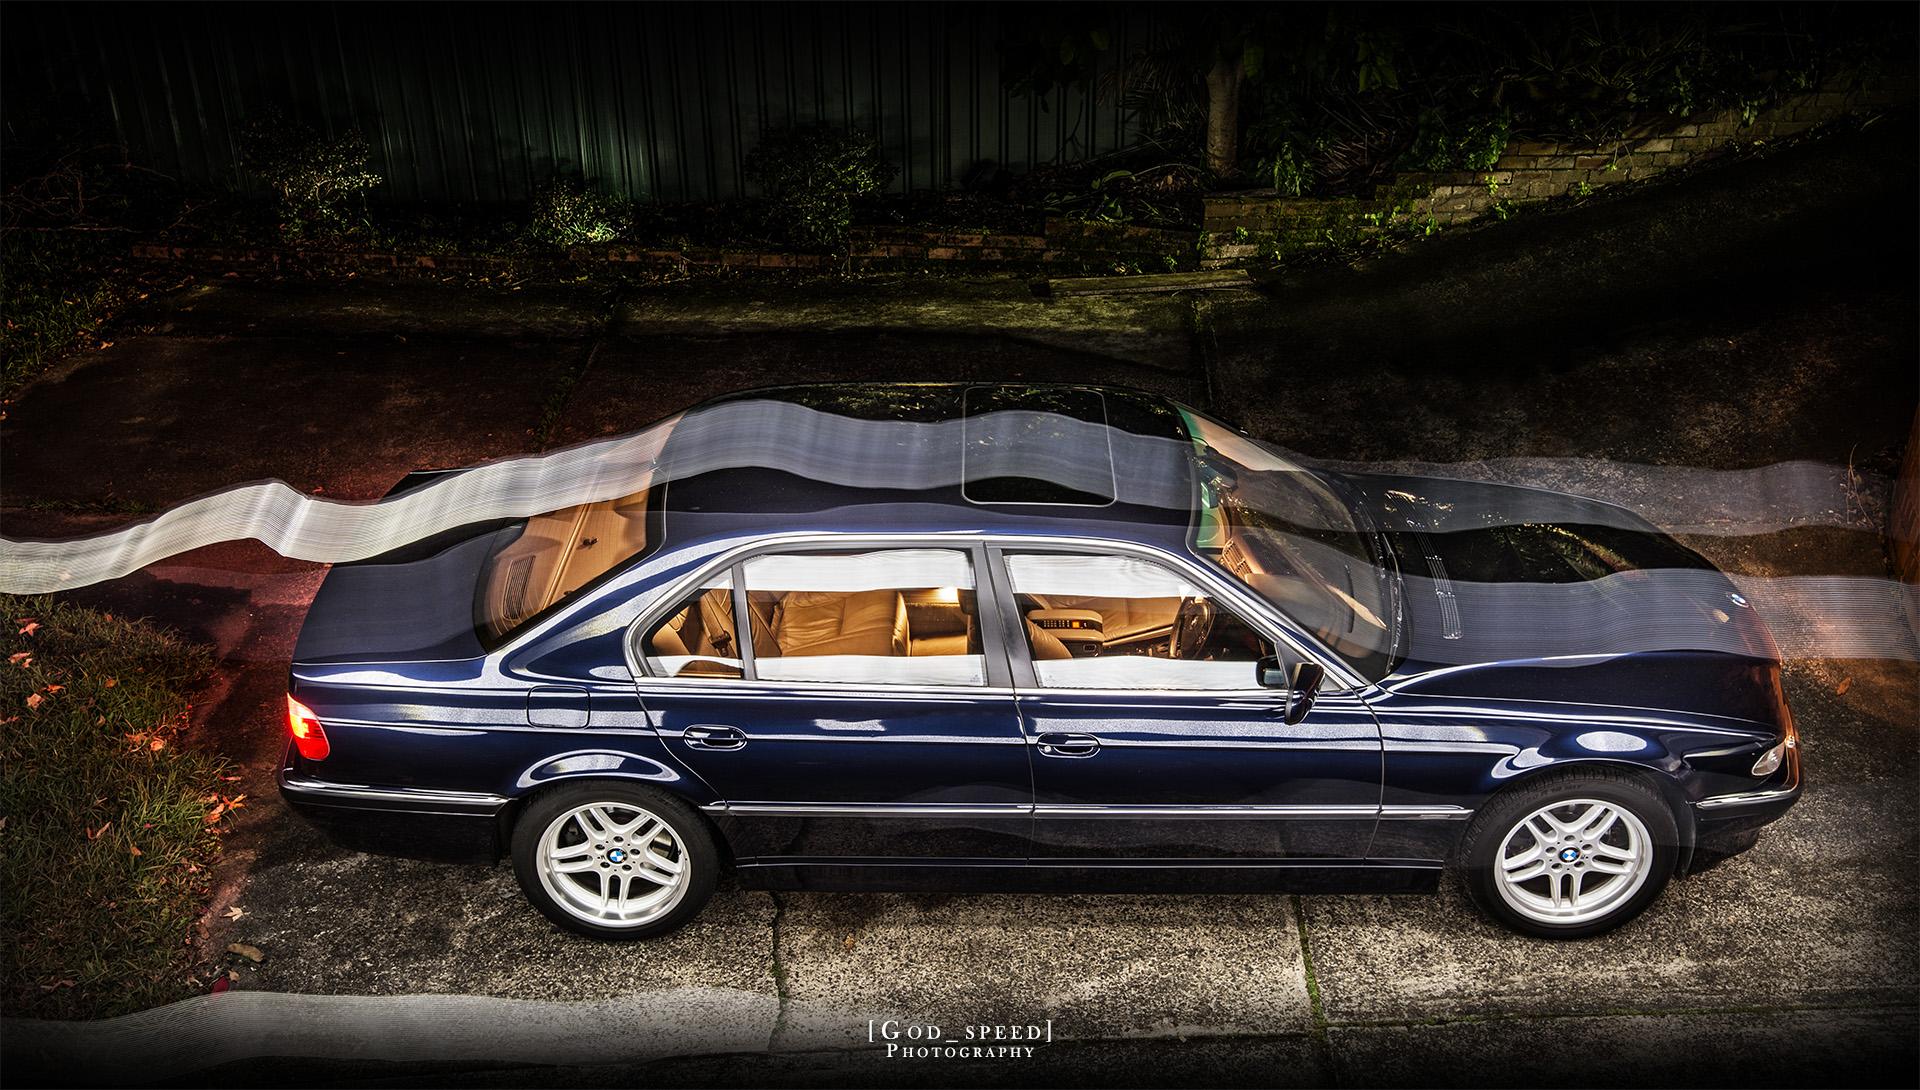 BMW E38 Club - Она прекрасна